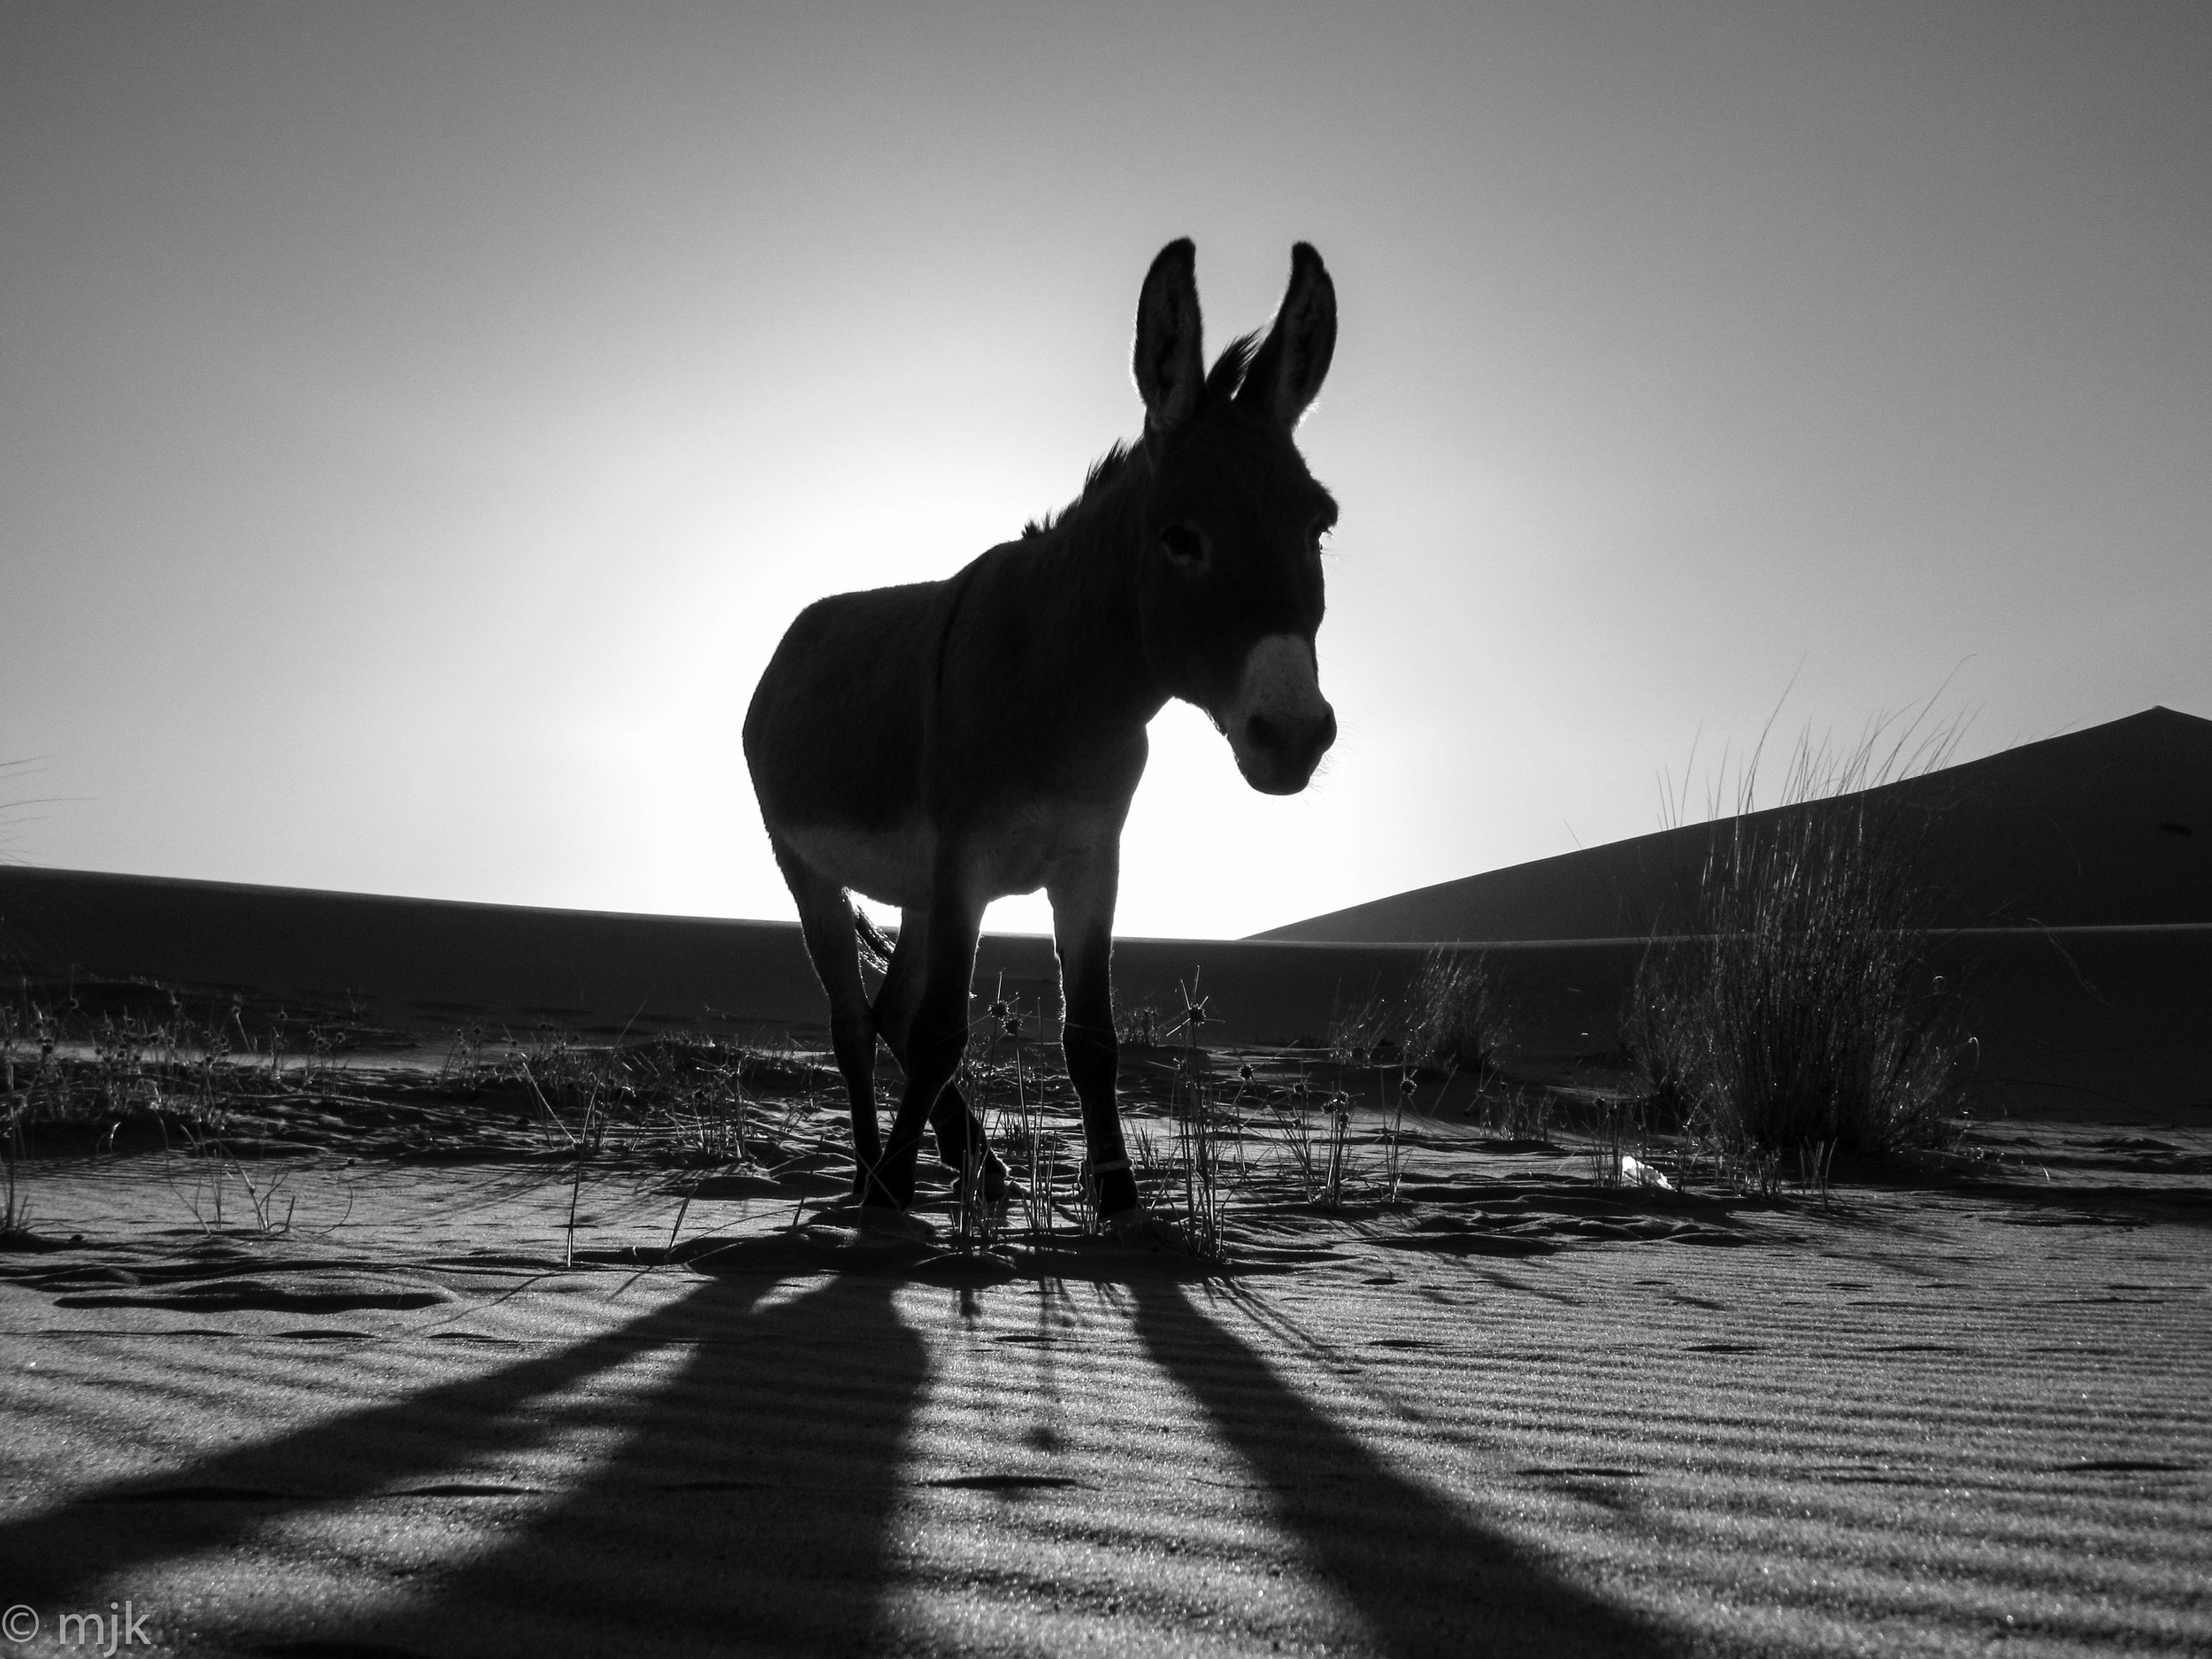 A donkey in the Sahara Desert outside Merzouga Morocco.